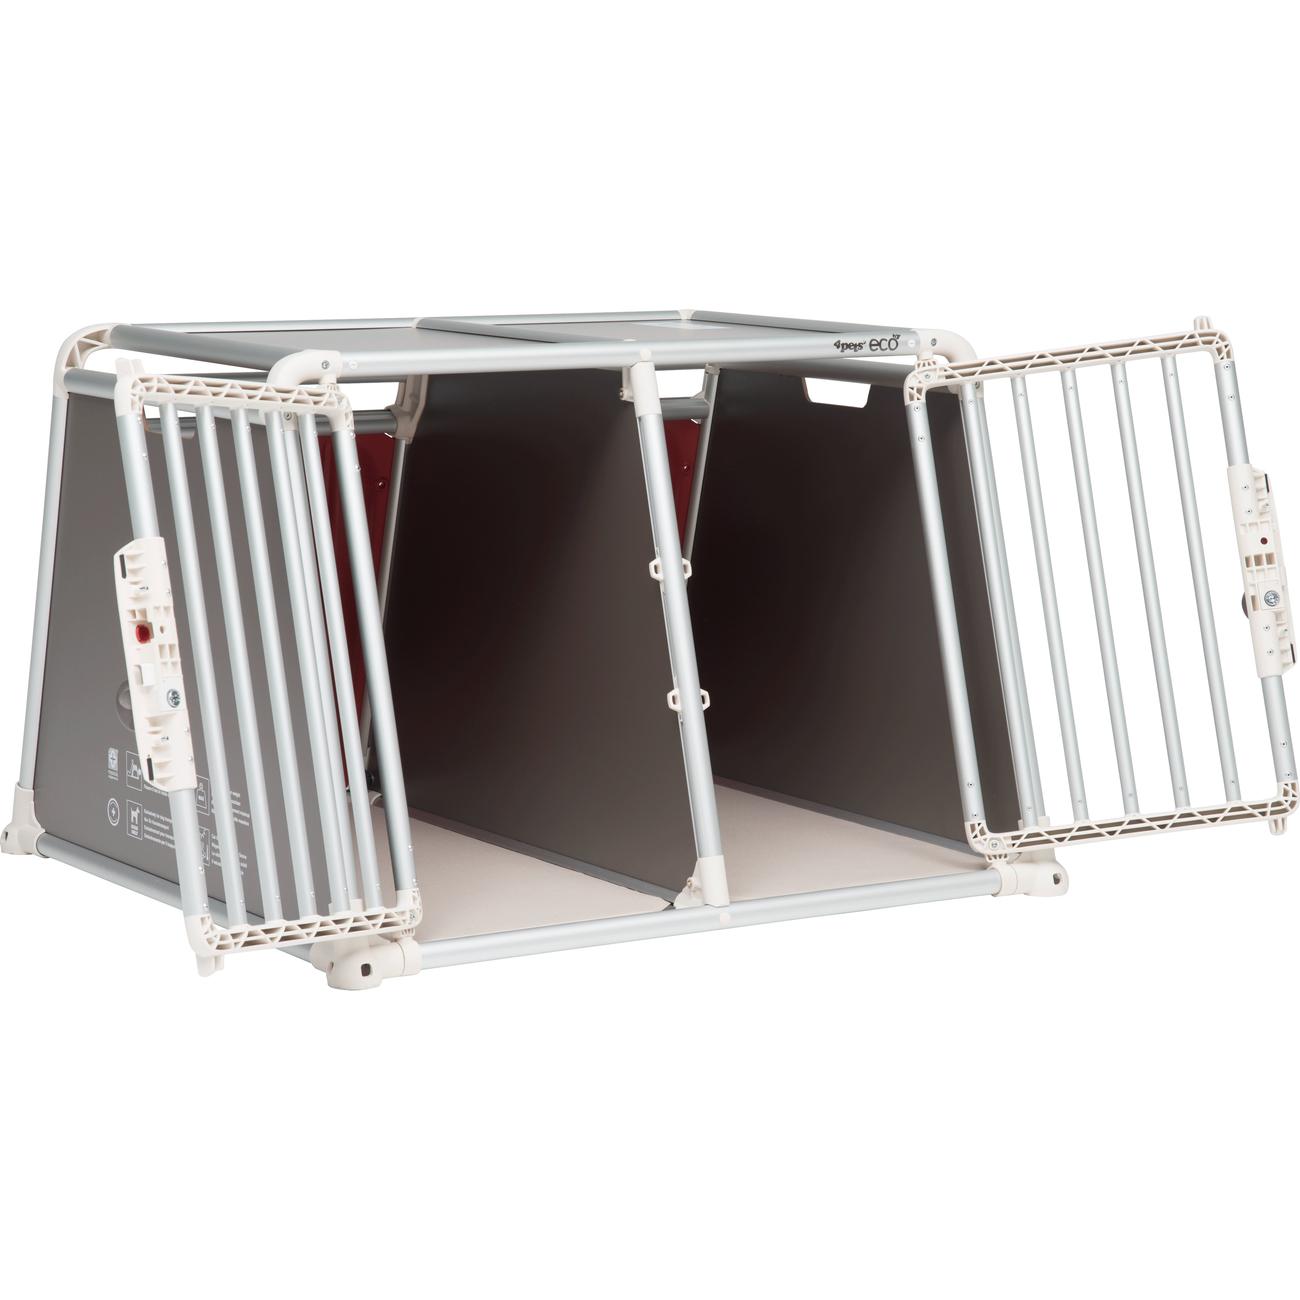 4pets Alu Autobox für 2 Hunde ECO 22, Bild 6